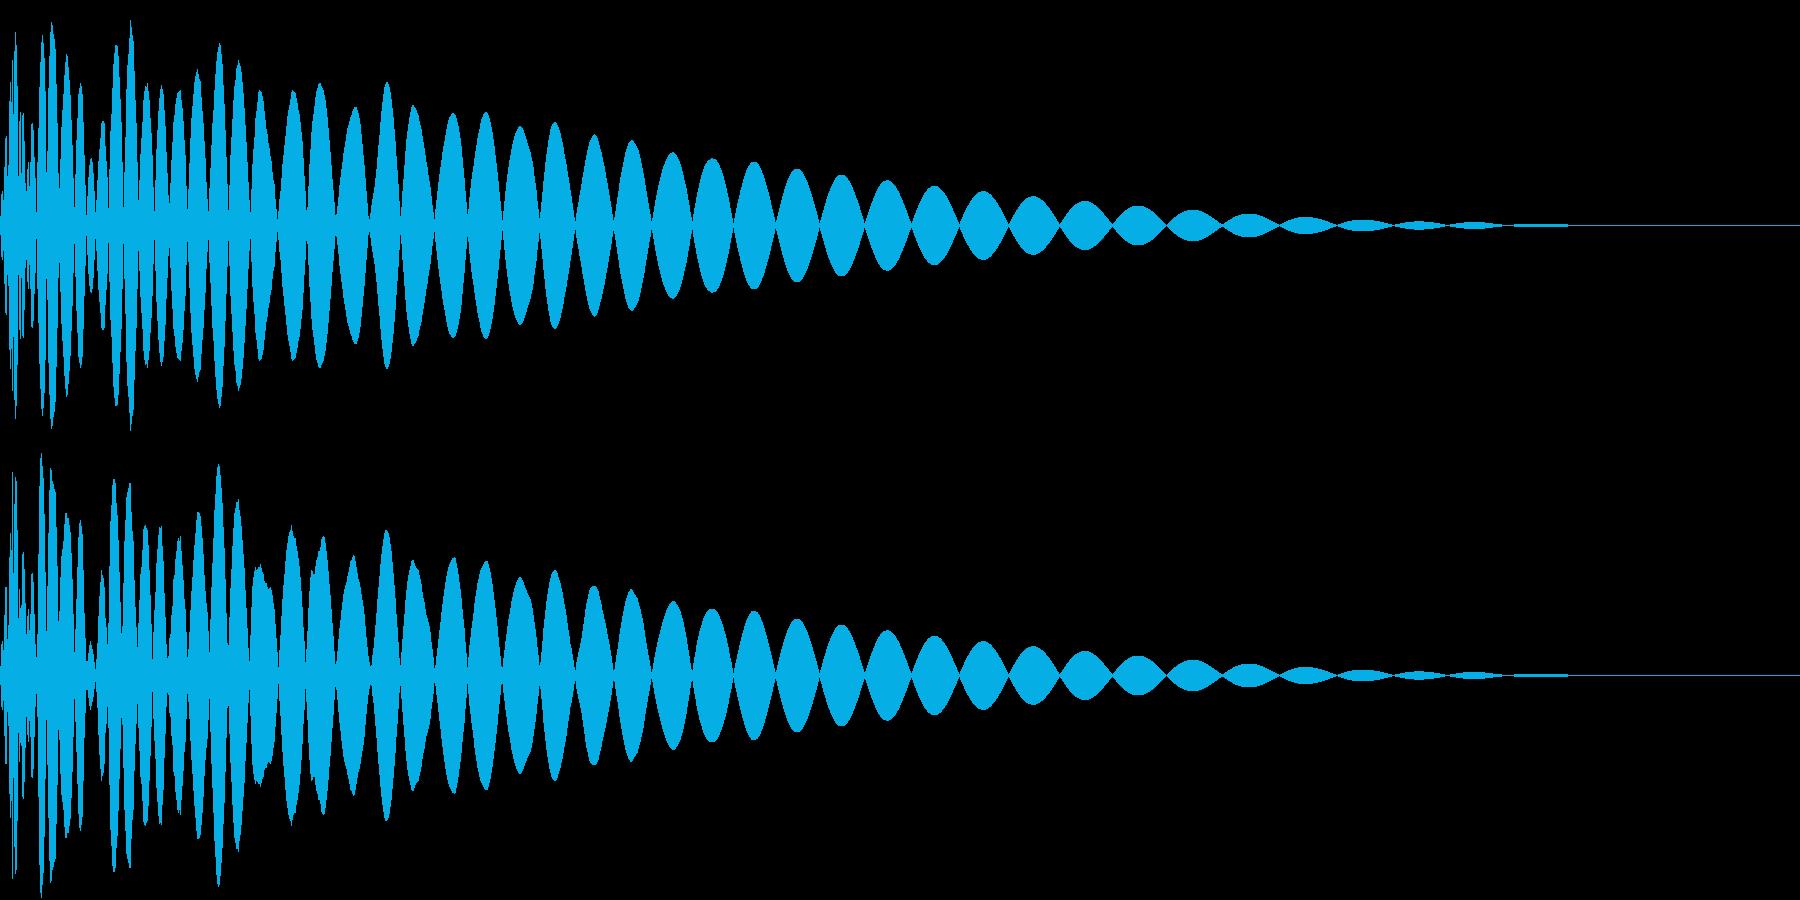 DTM Kick 12 オリジナル音源の再生済みの波形